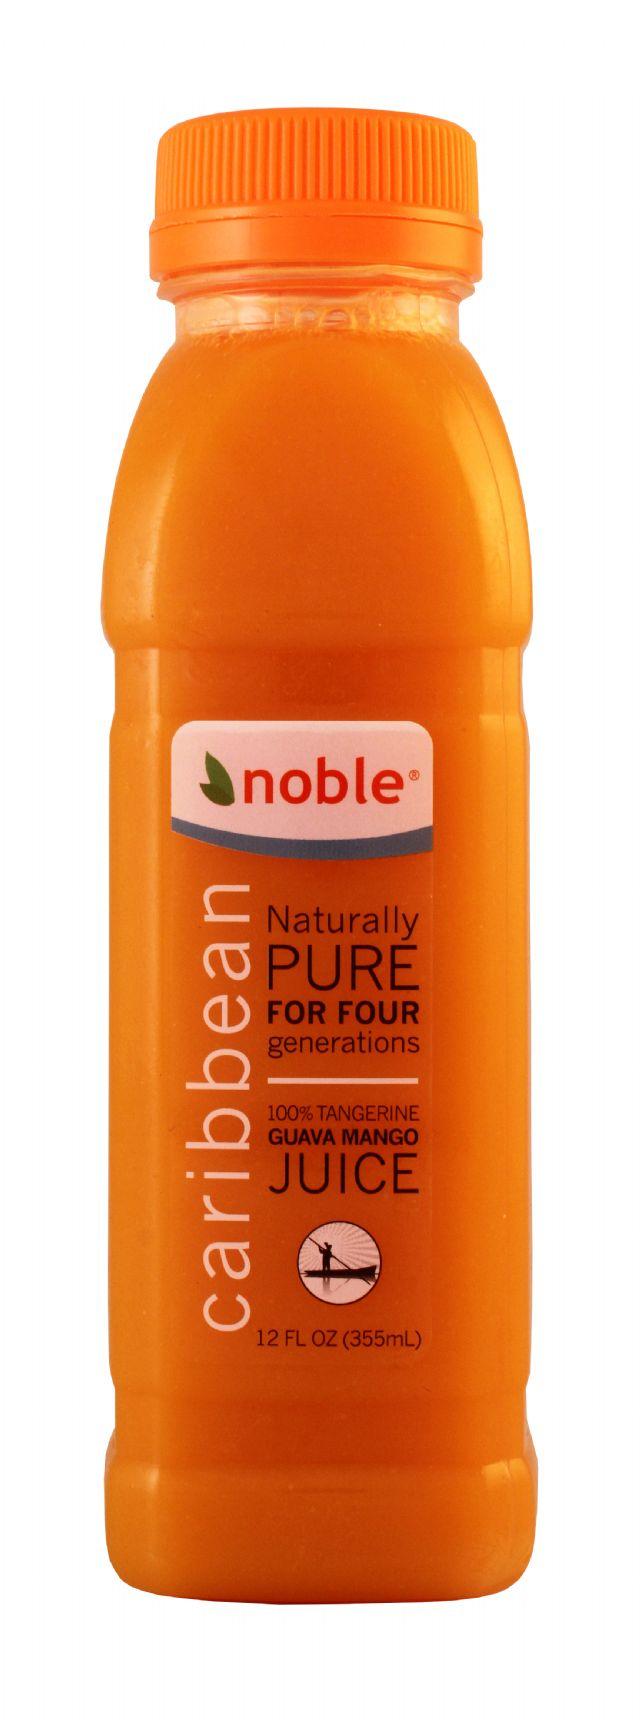 Noble: Noble Carib Front